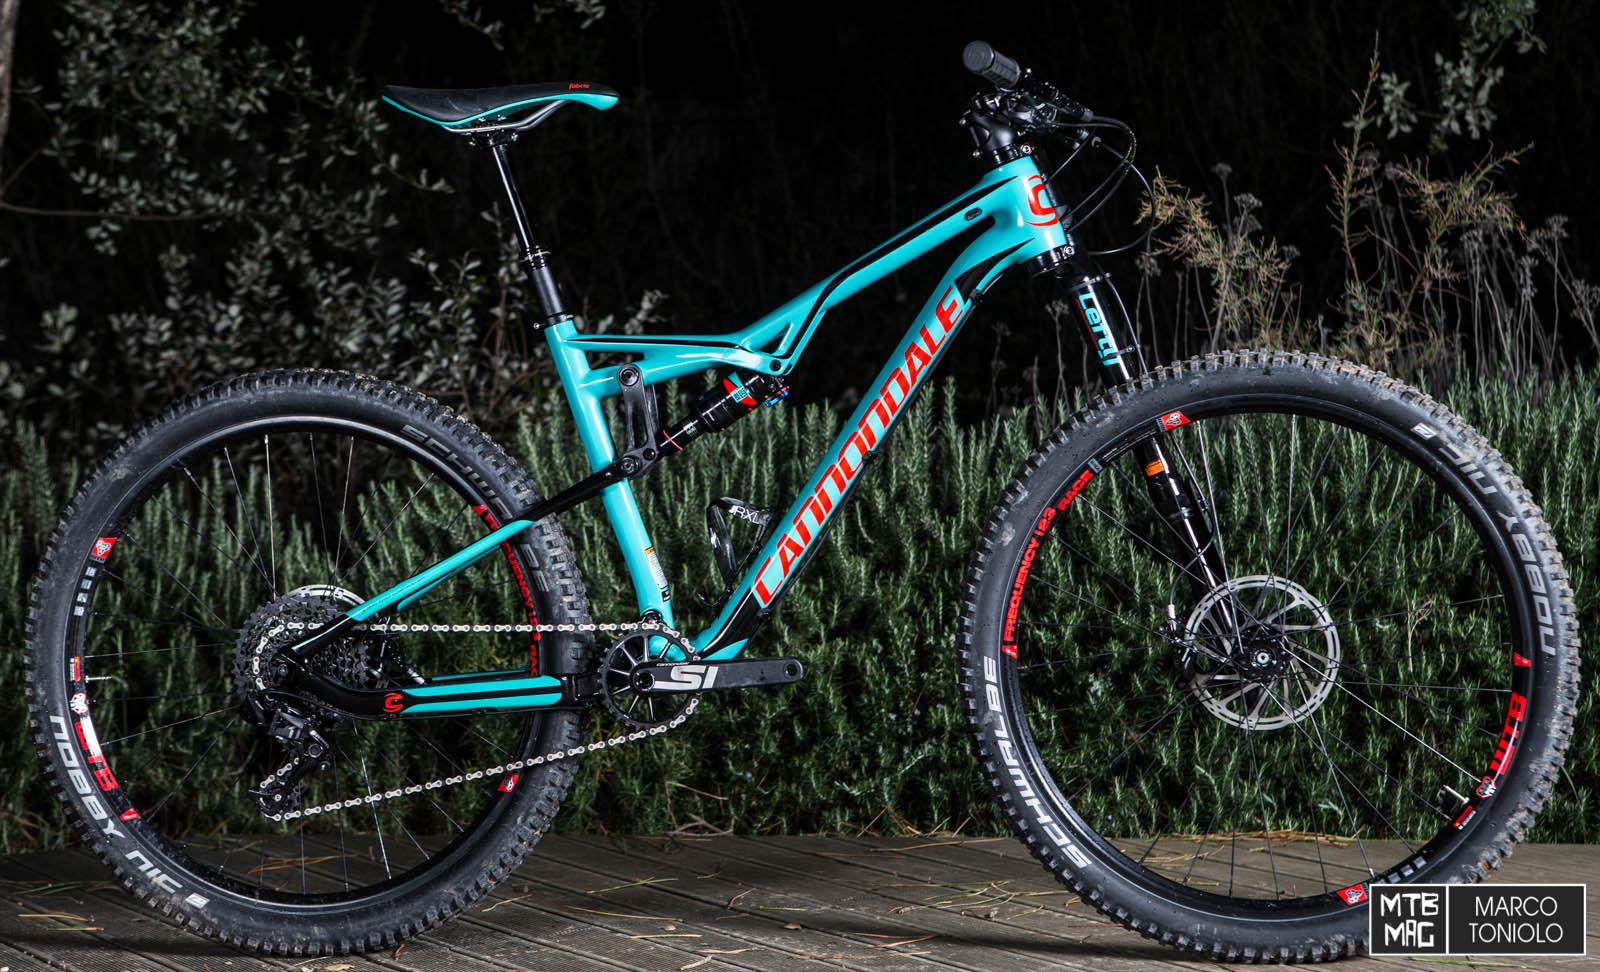 Bicicletta Itek 27 5